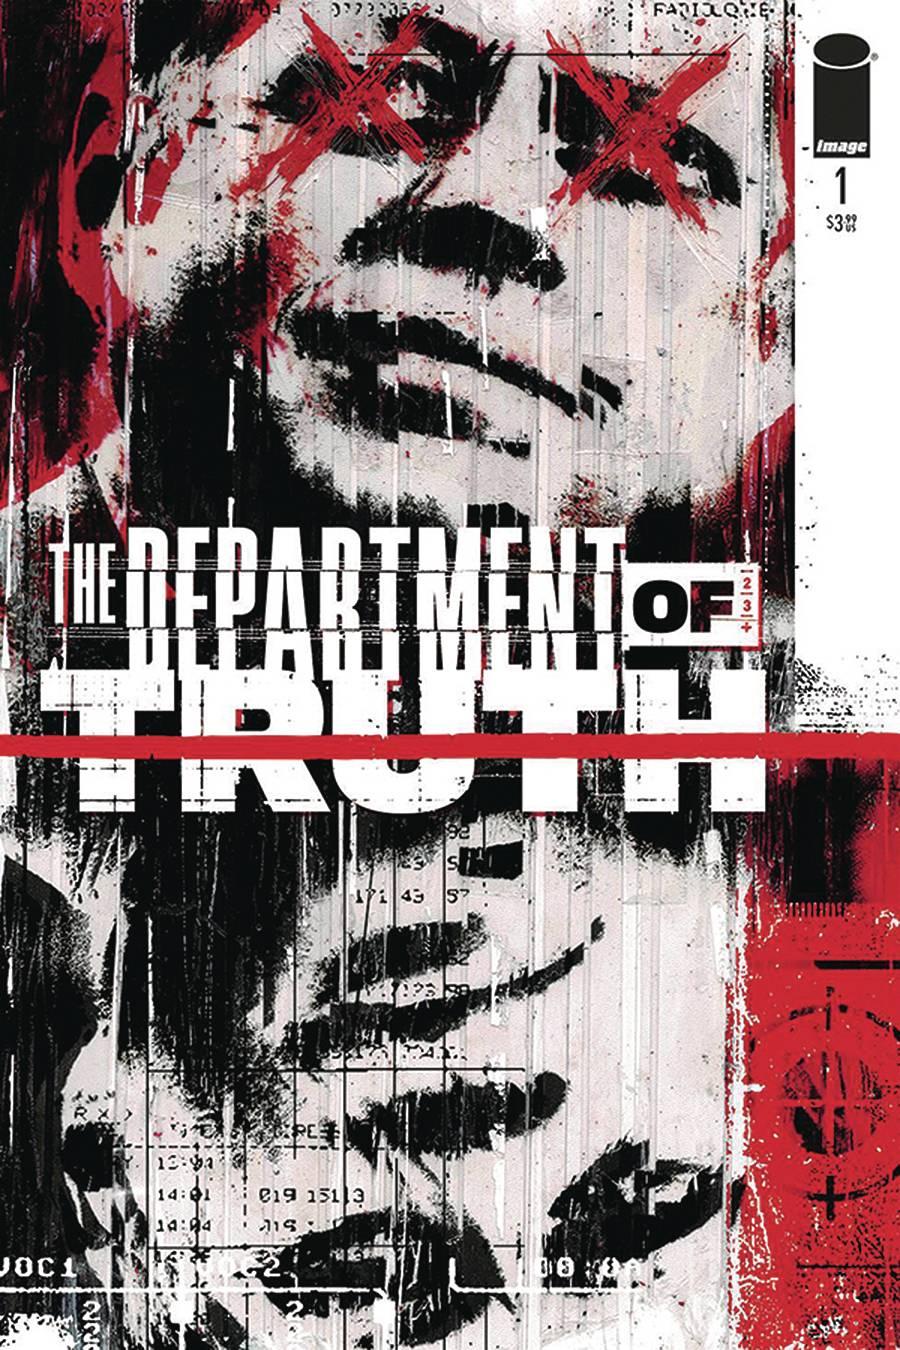 DF DEPT OF TRUTH #1 CGC GRADED